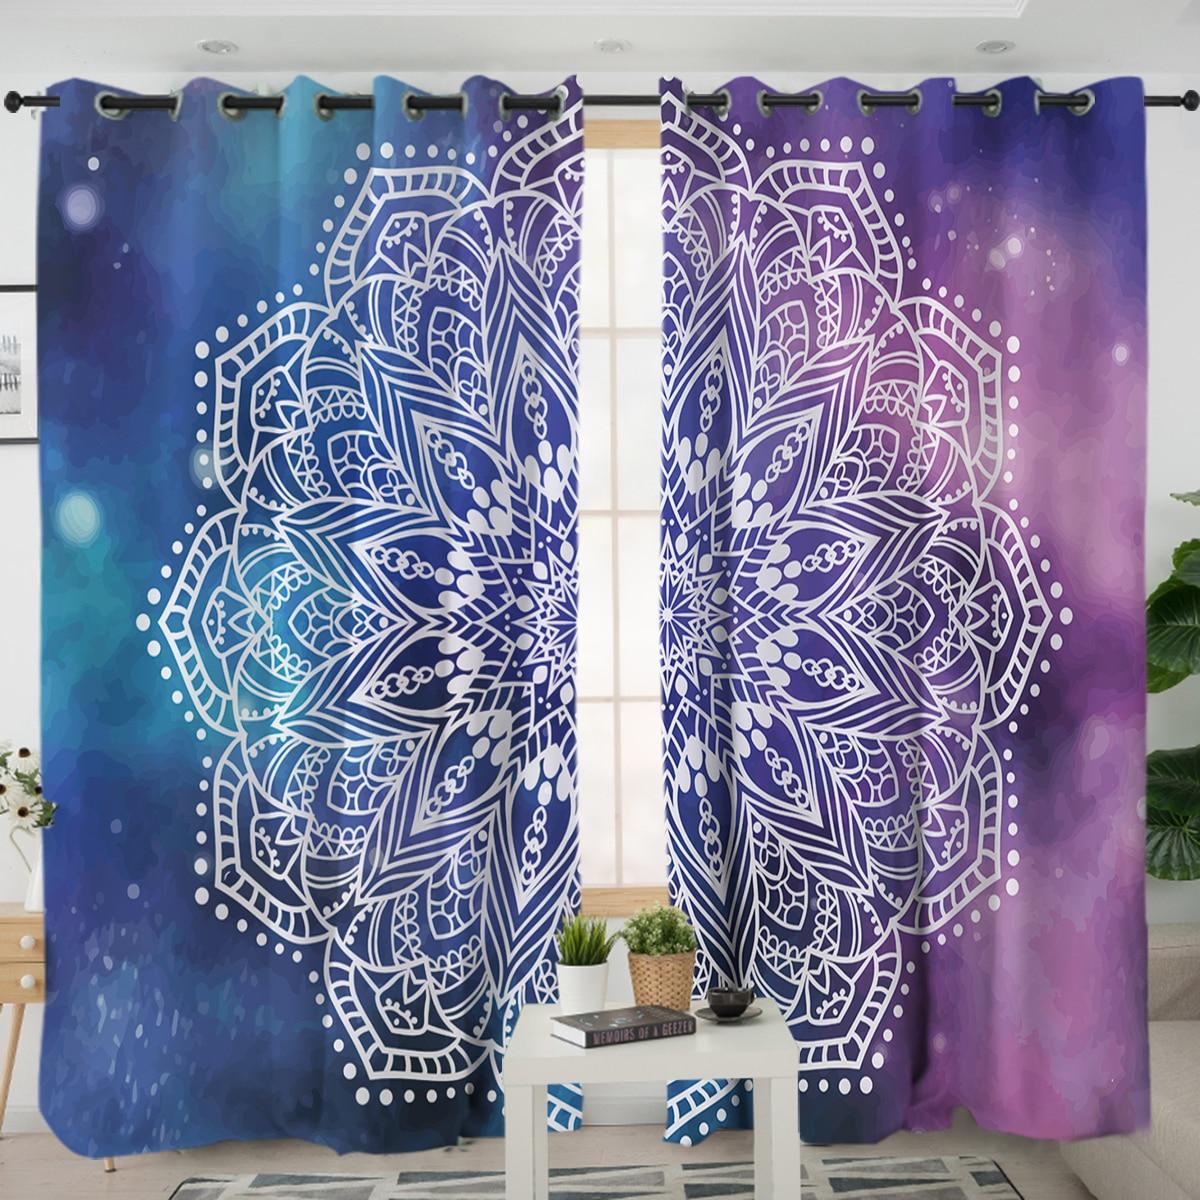 Cortinas 3D para ventana, Cortinas De Dormitorio, Mandala bohemio, flores, decoración del hogar, salón